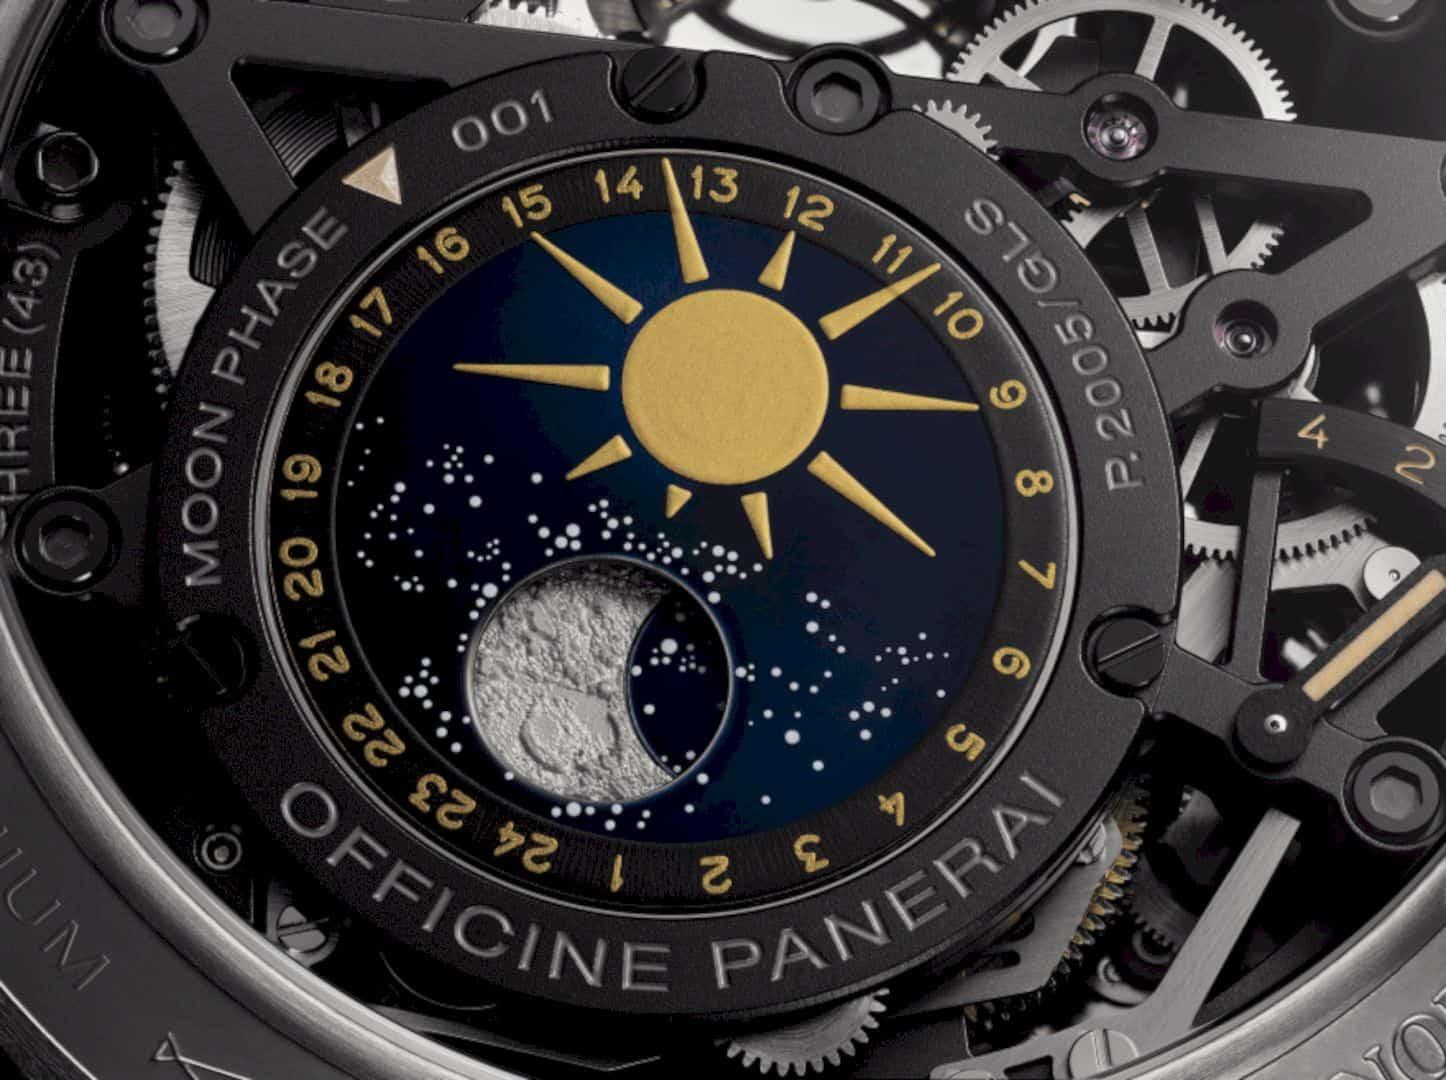 L'Astronomo Luminor 1950 Tourbillon Watch 2